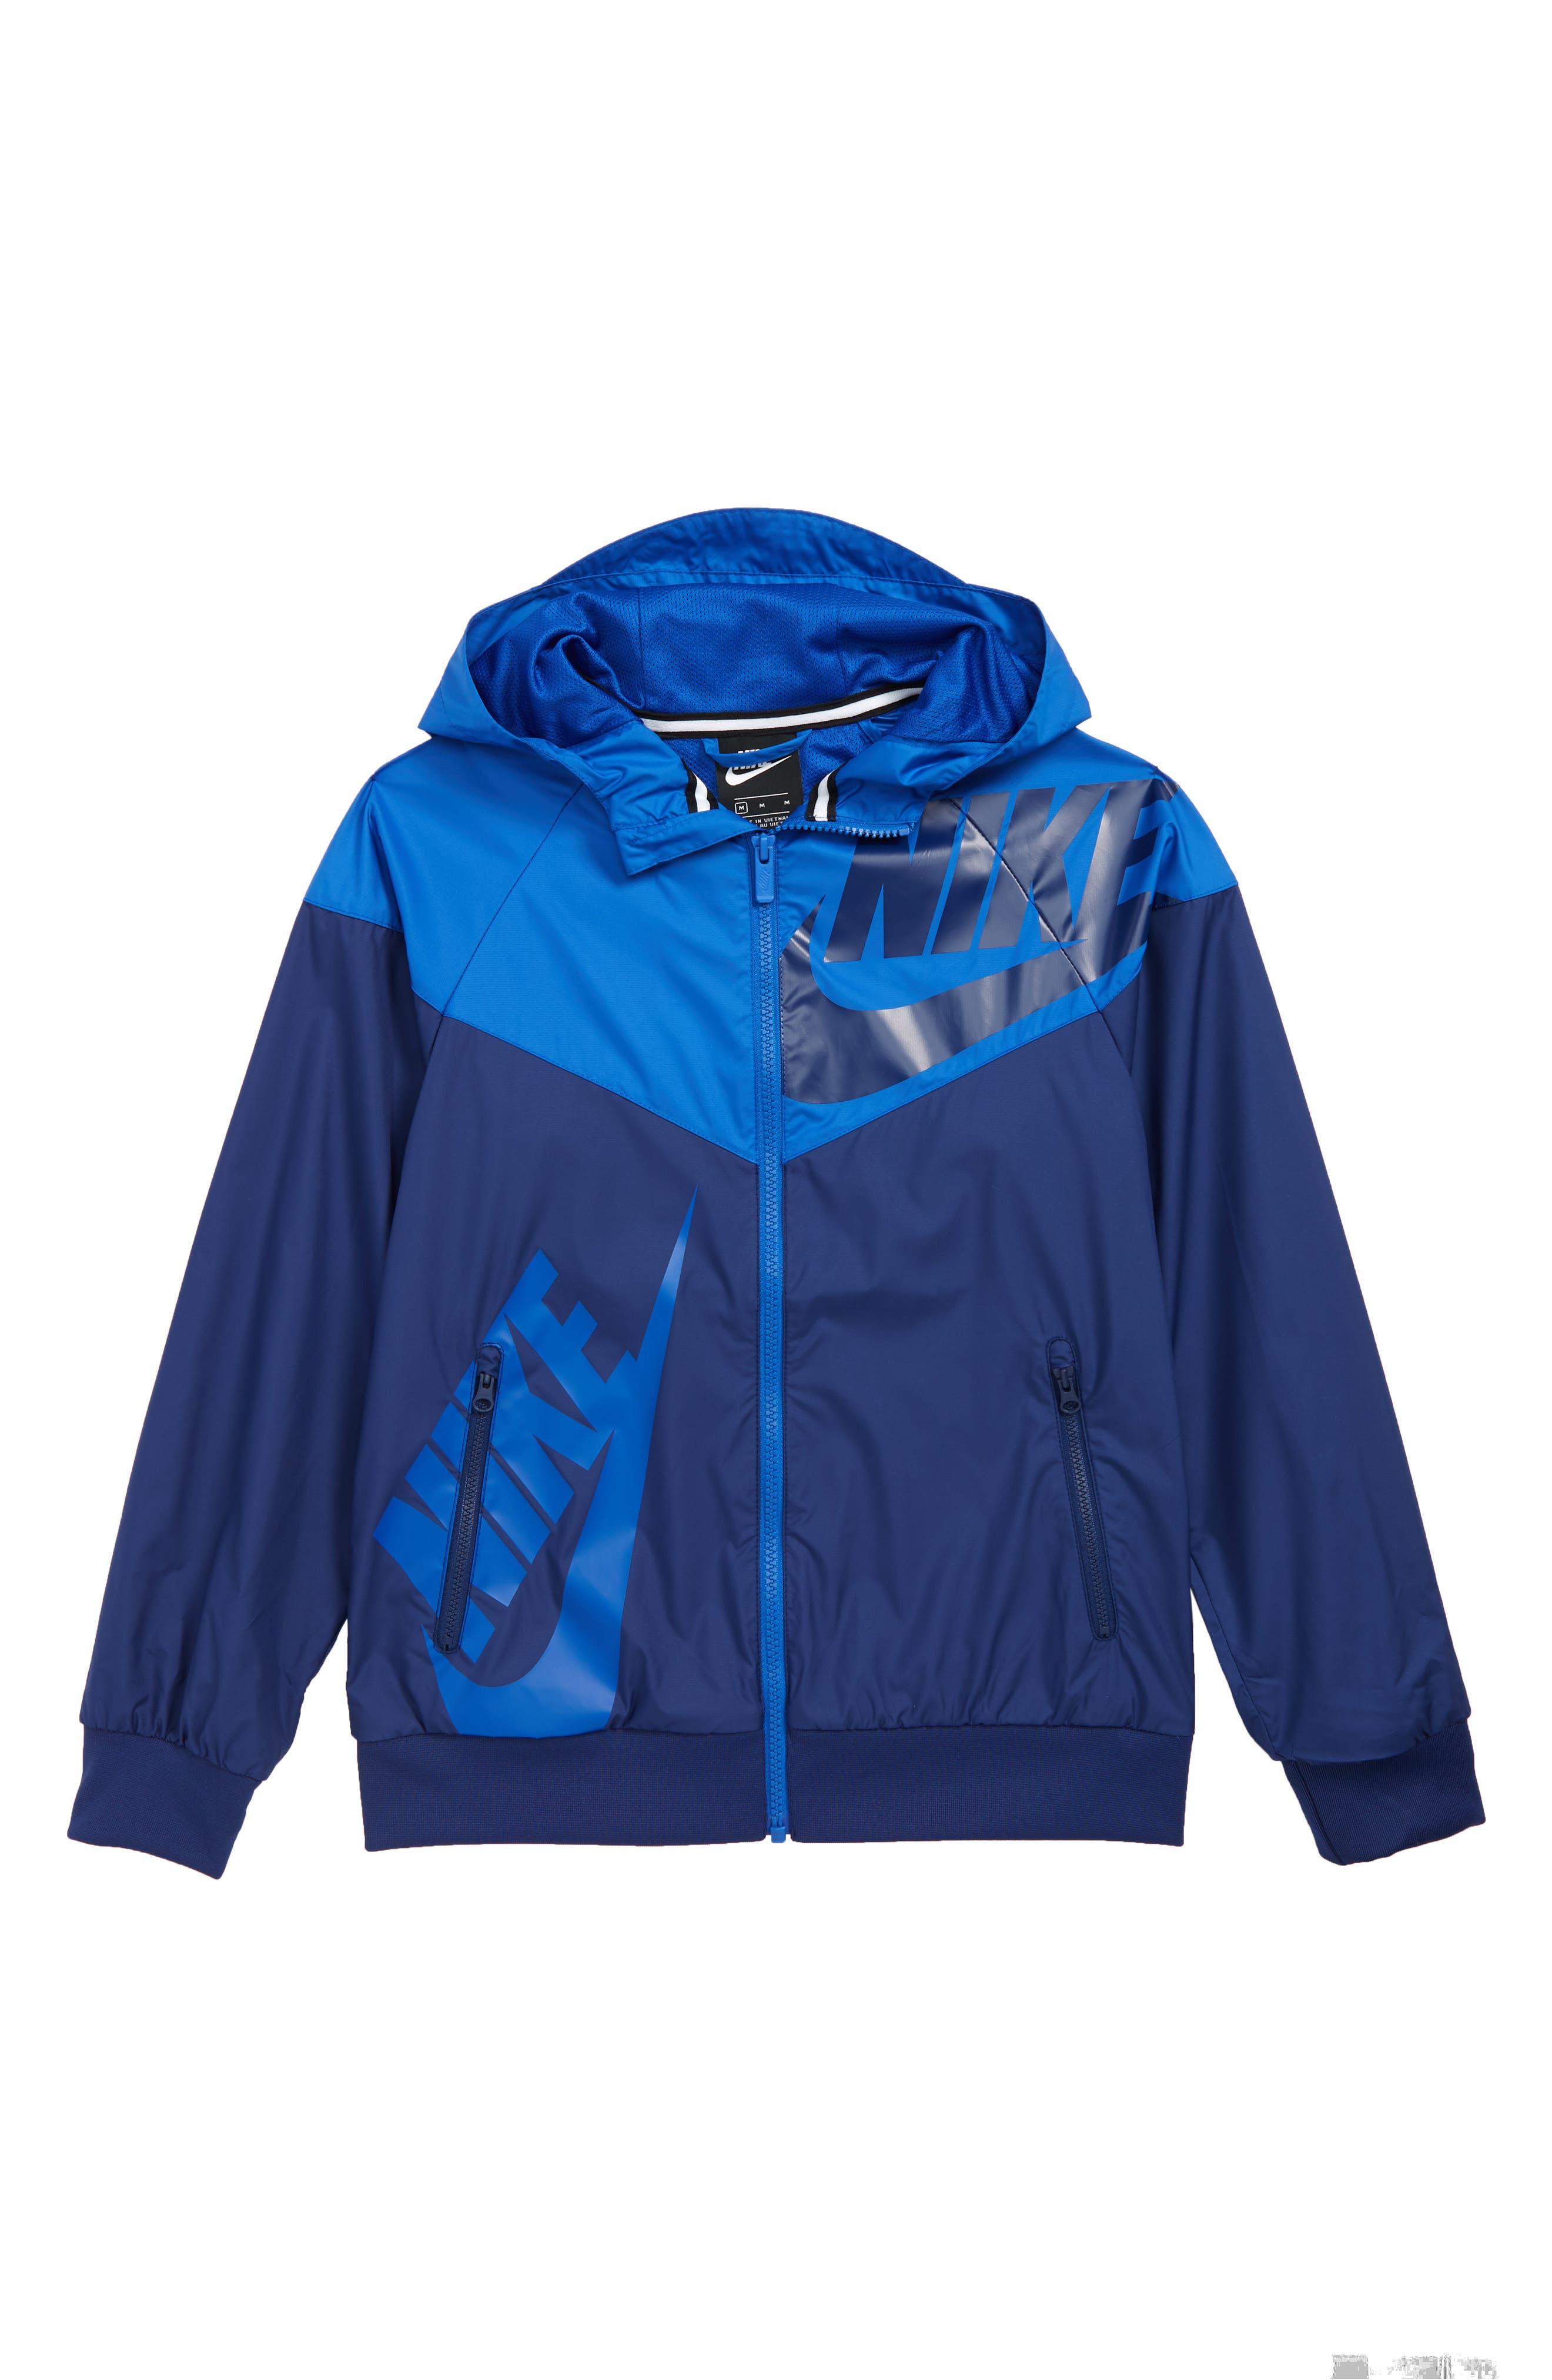 NIKE Sportswear Windrunner Zip Jacket, Main, color, BLUE VOID/ GAME ROYAL